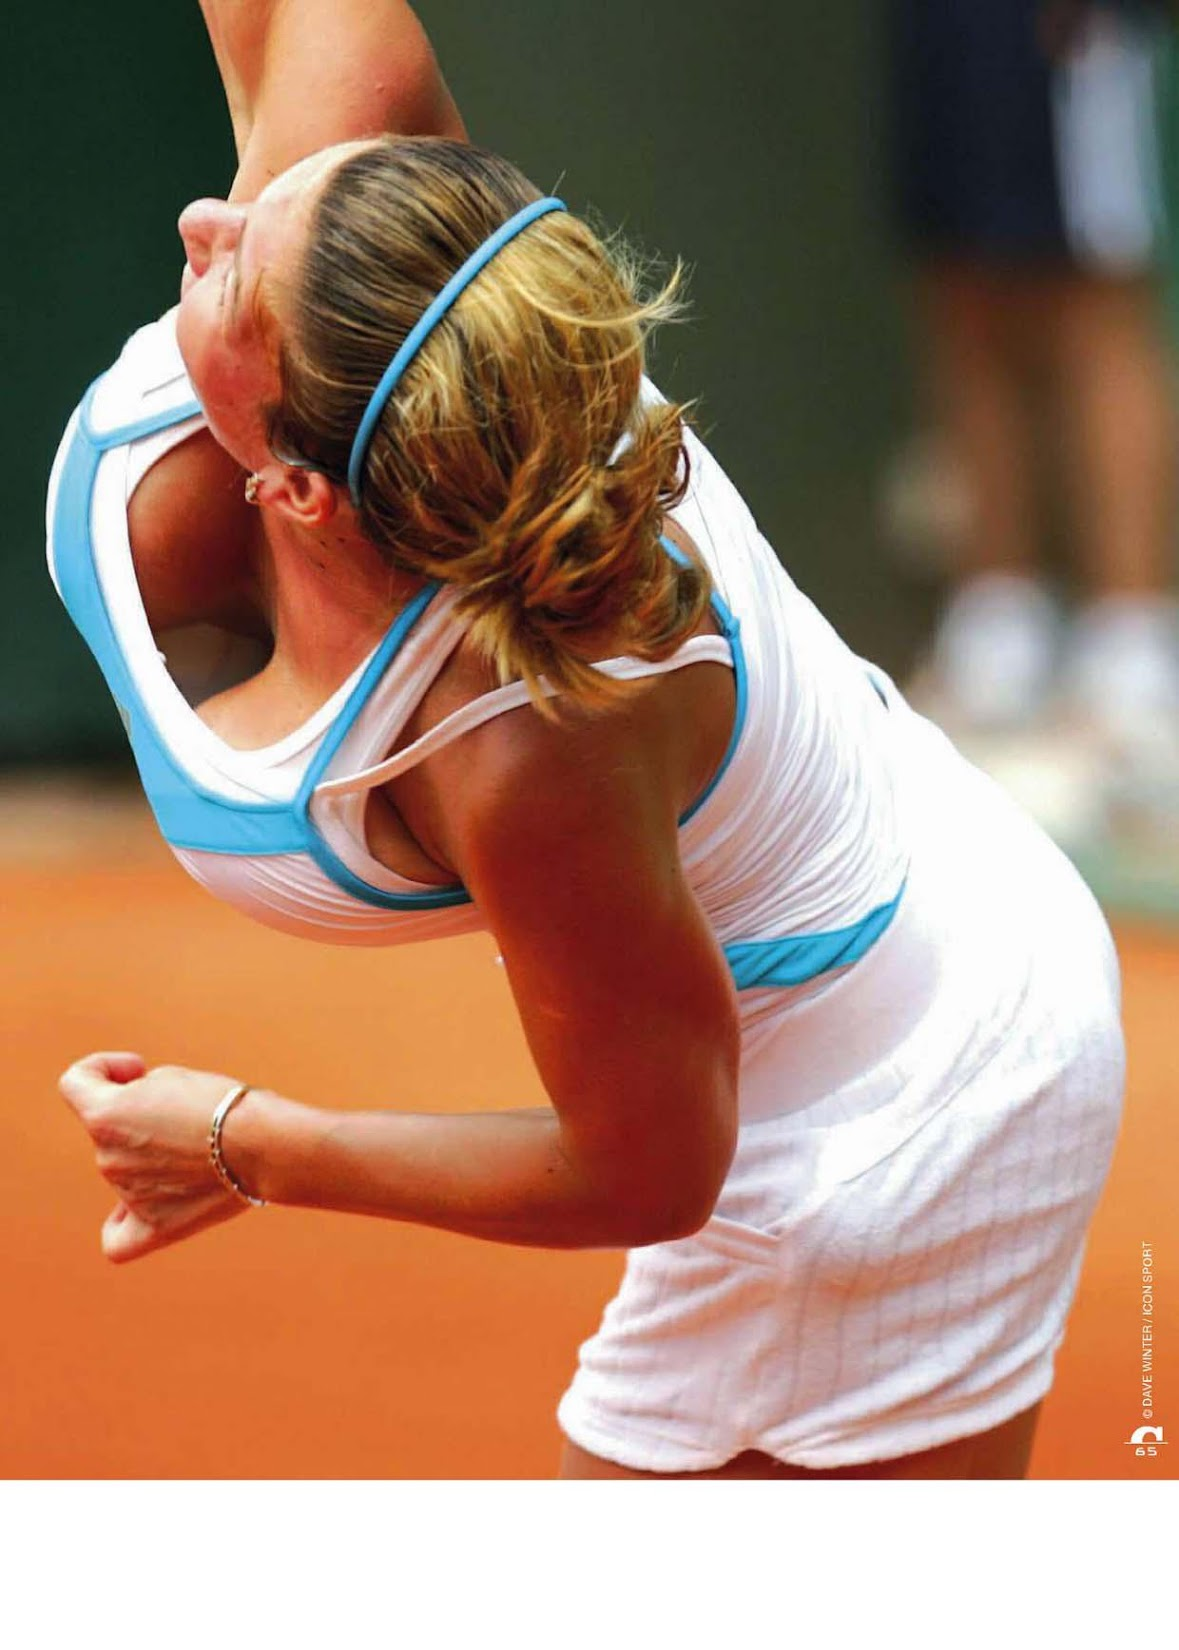 http://4.bp.blogspot.com/-UI-sCxzPEHM/UKpS4DWxqdI/AAAAAAAABvM/6gfD9r78COY/s1650/simona+halep+nude+big+tits+busty+tetas+enormes+blogspot+xl+busty+tennis+player+0.jpg